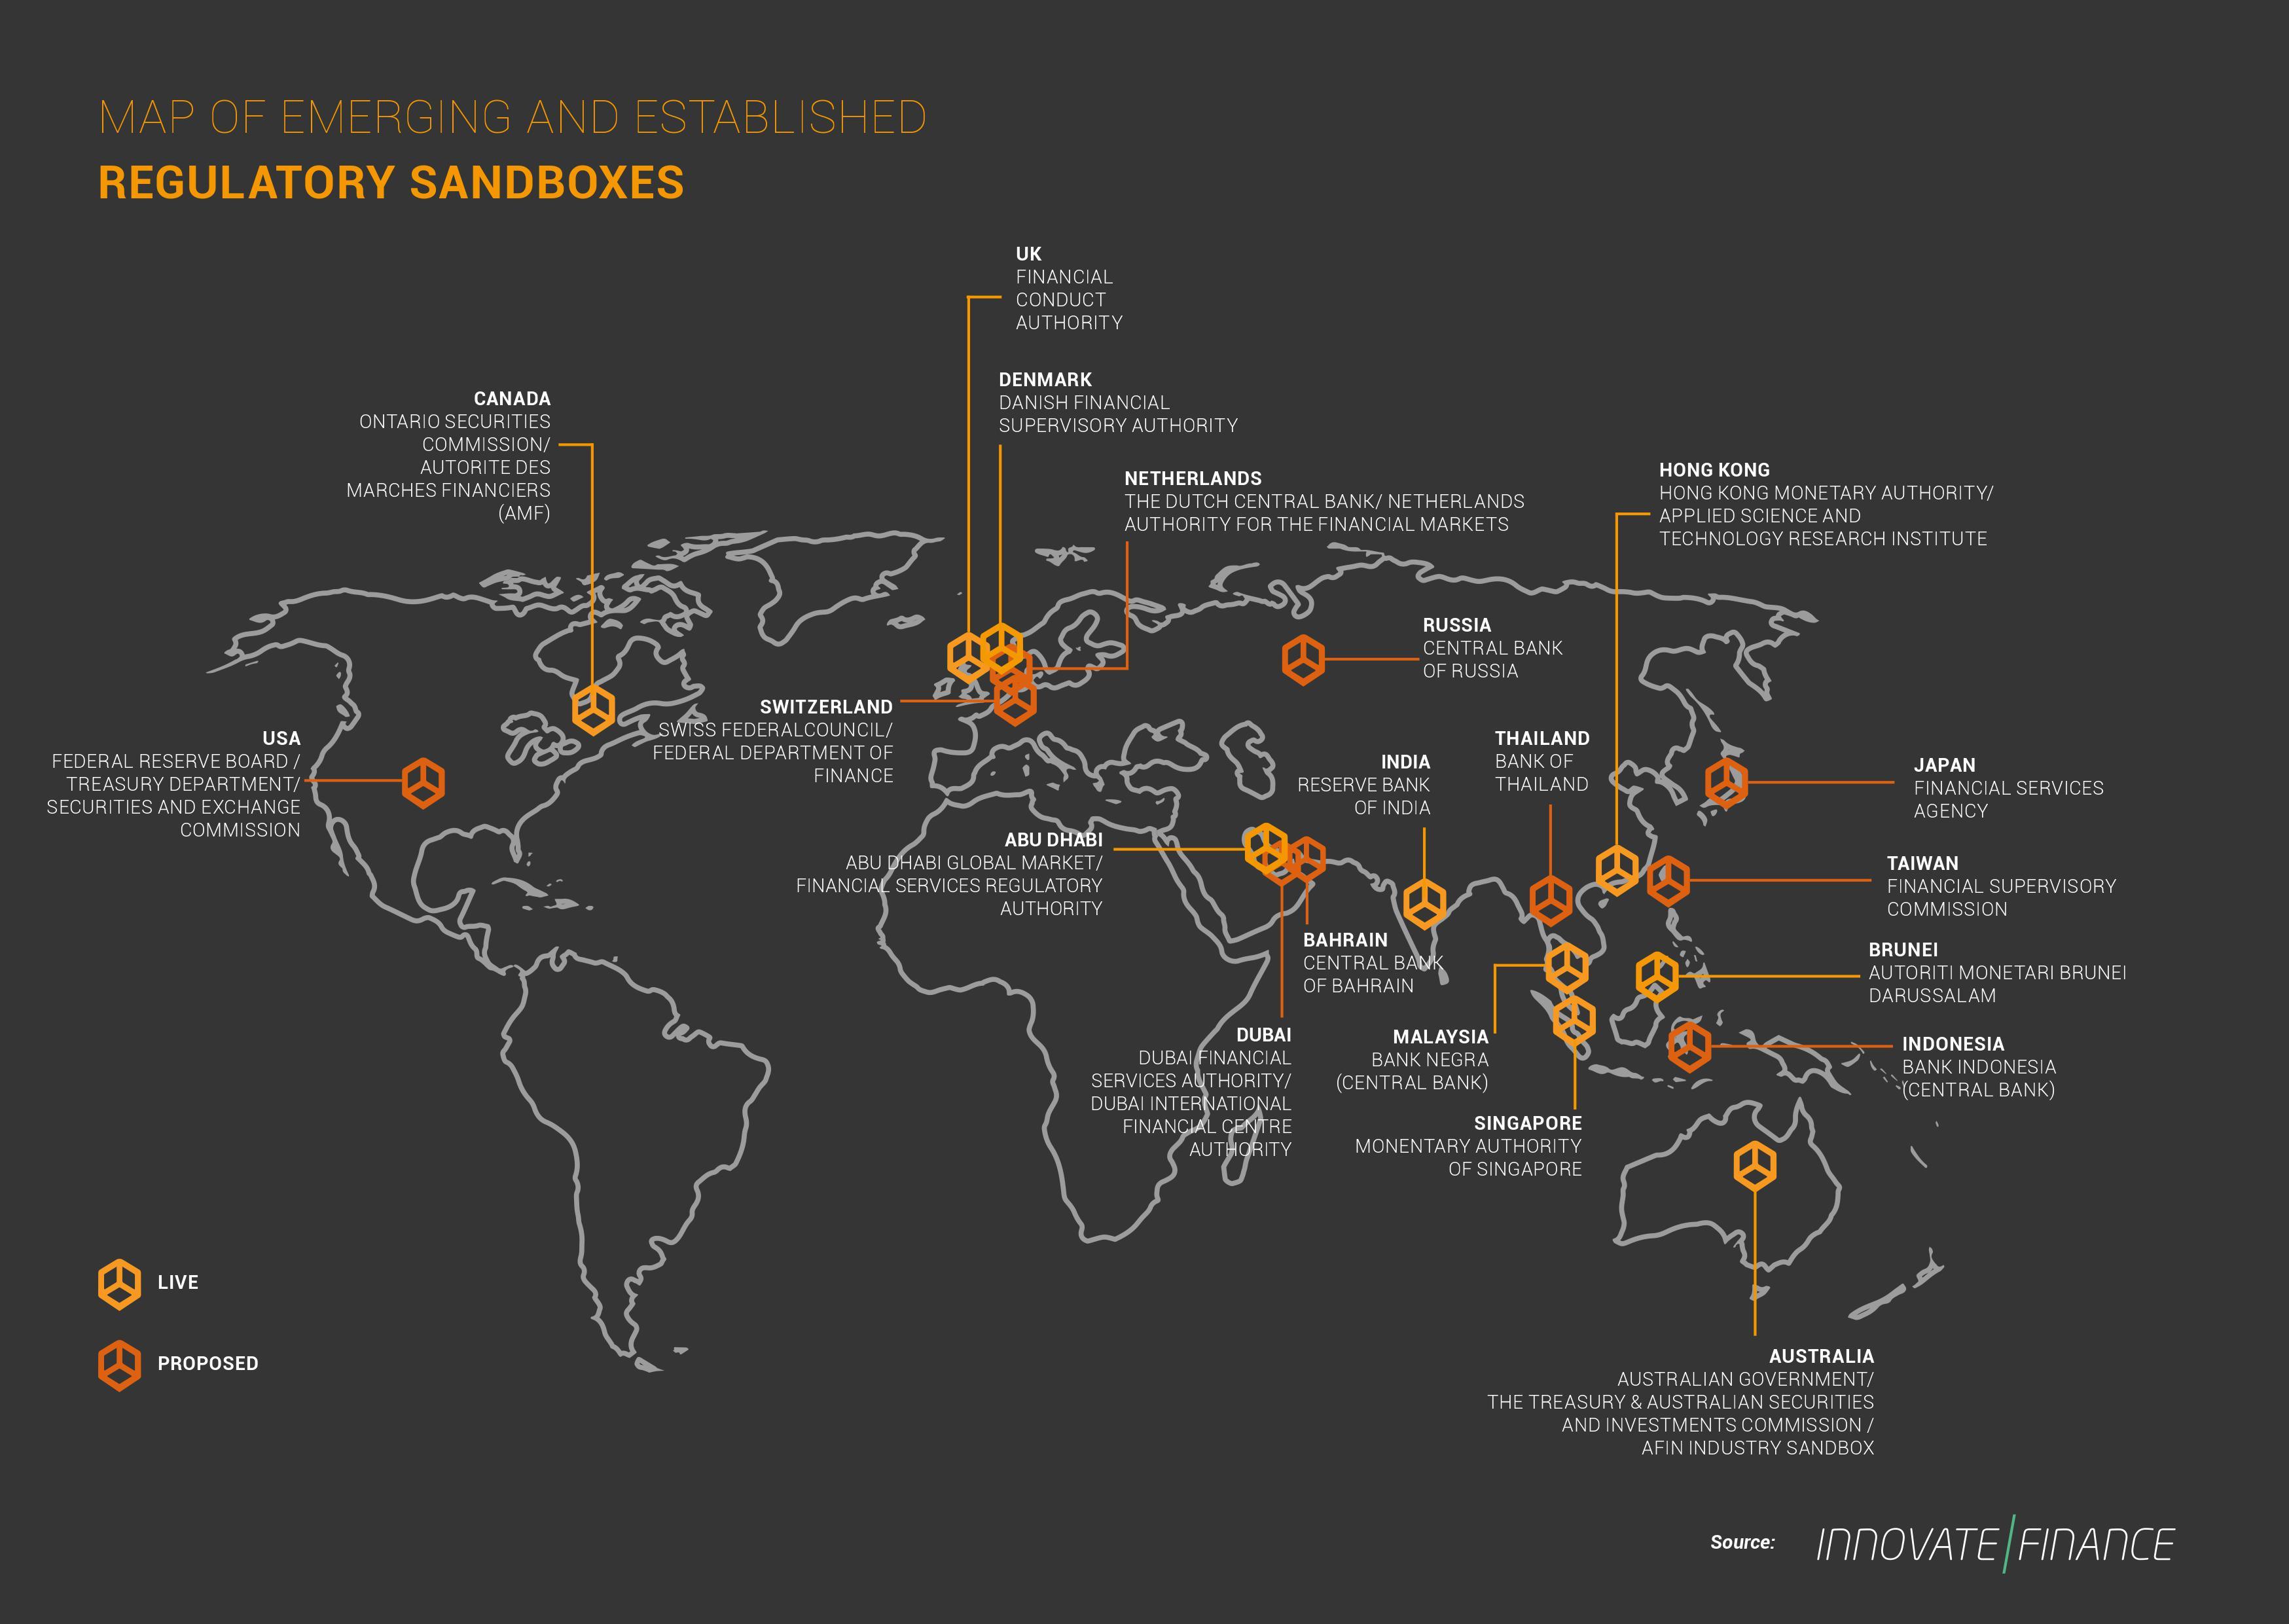 Regulatory sandboxes